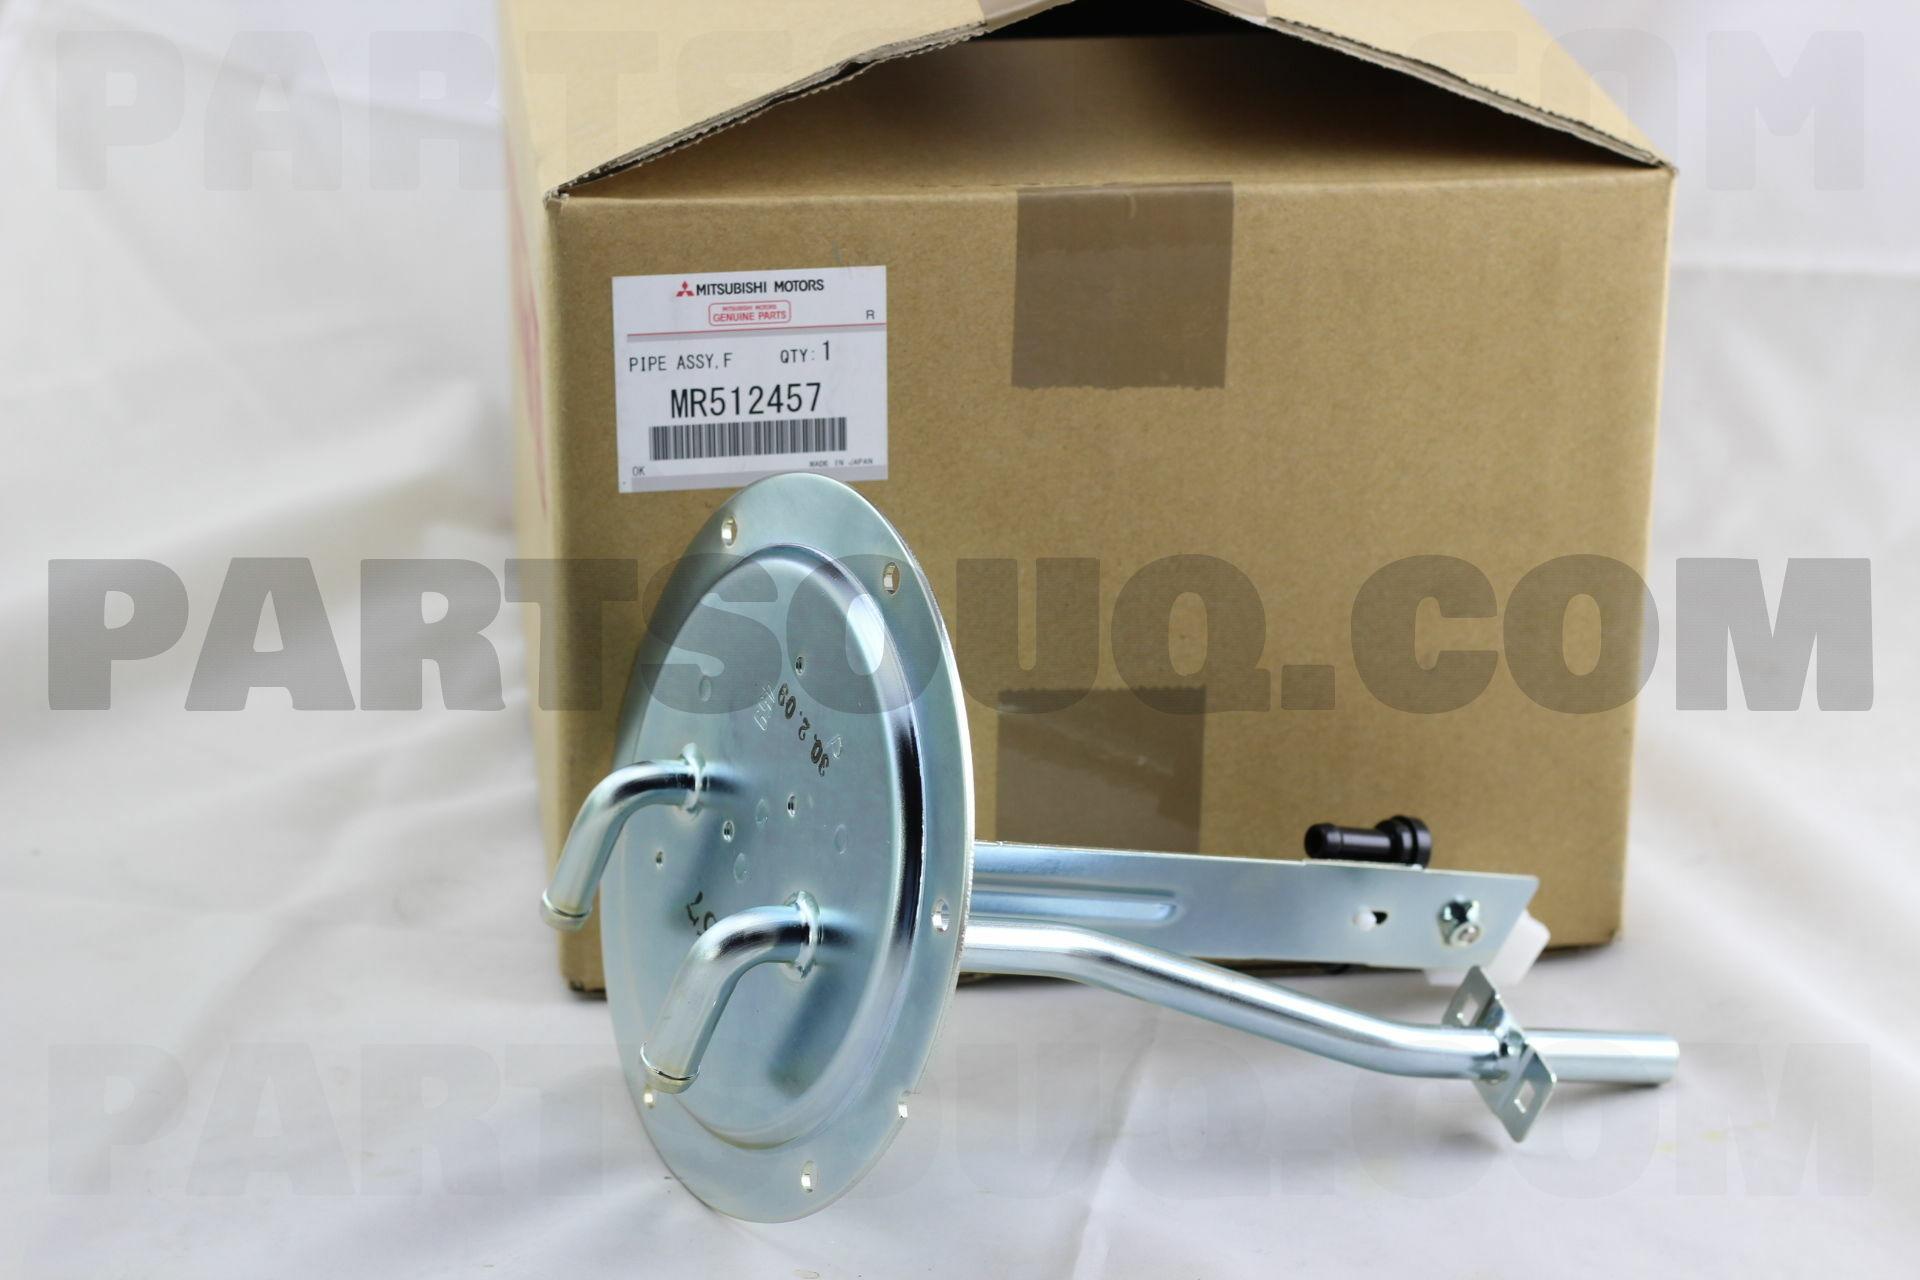 Mr512457 Mitsubishi Pipe Assyfuel Tank Filter Price 12567 Fuel